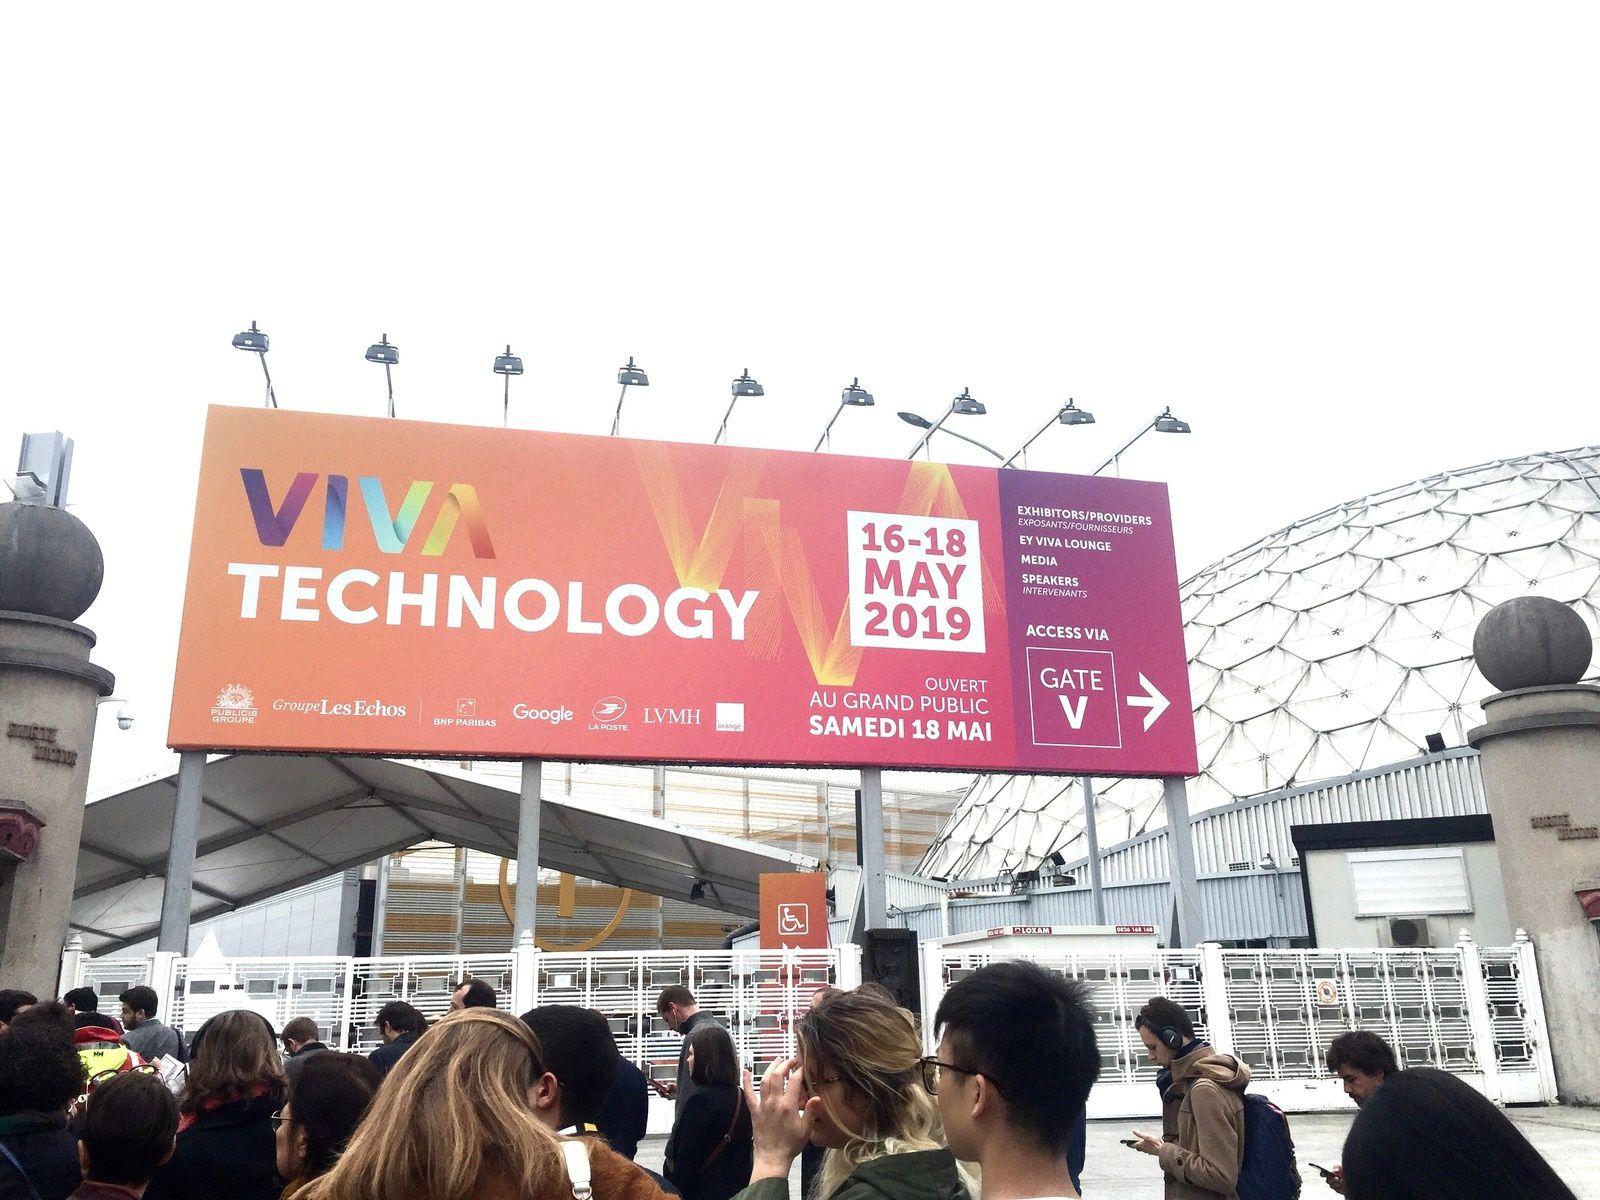 Viva Technology 2019 : j'y étais ! (vidéo)